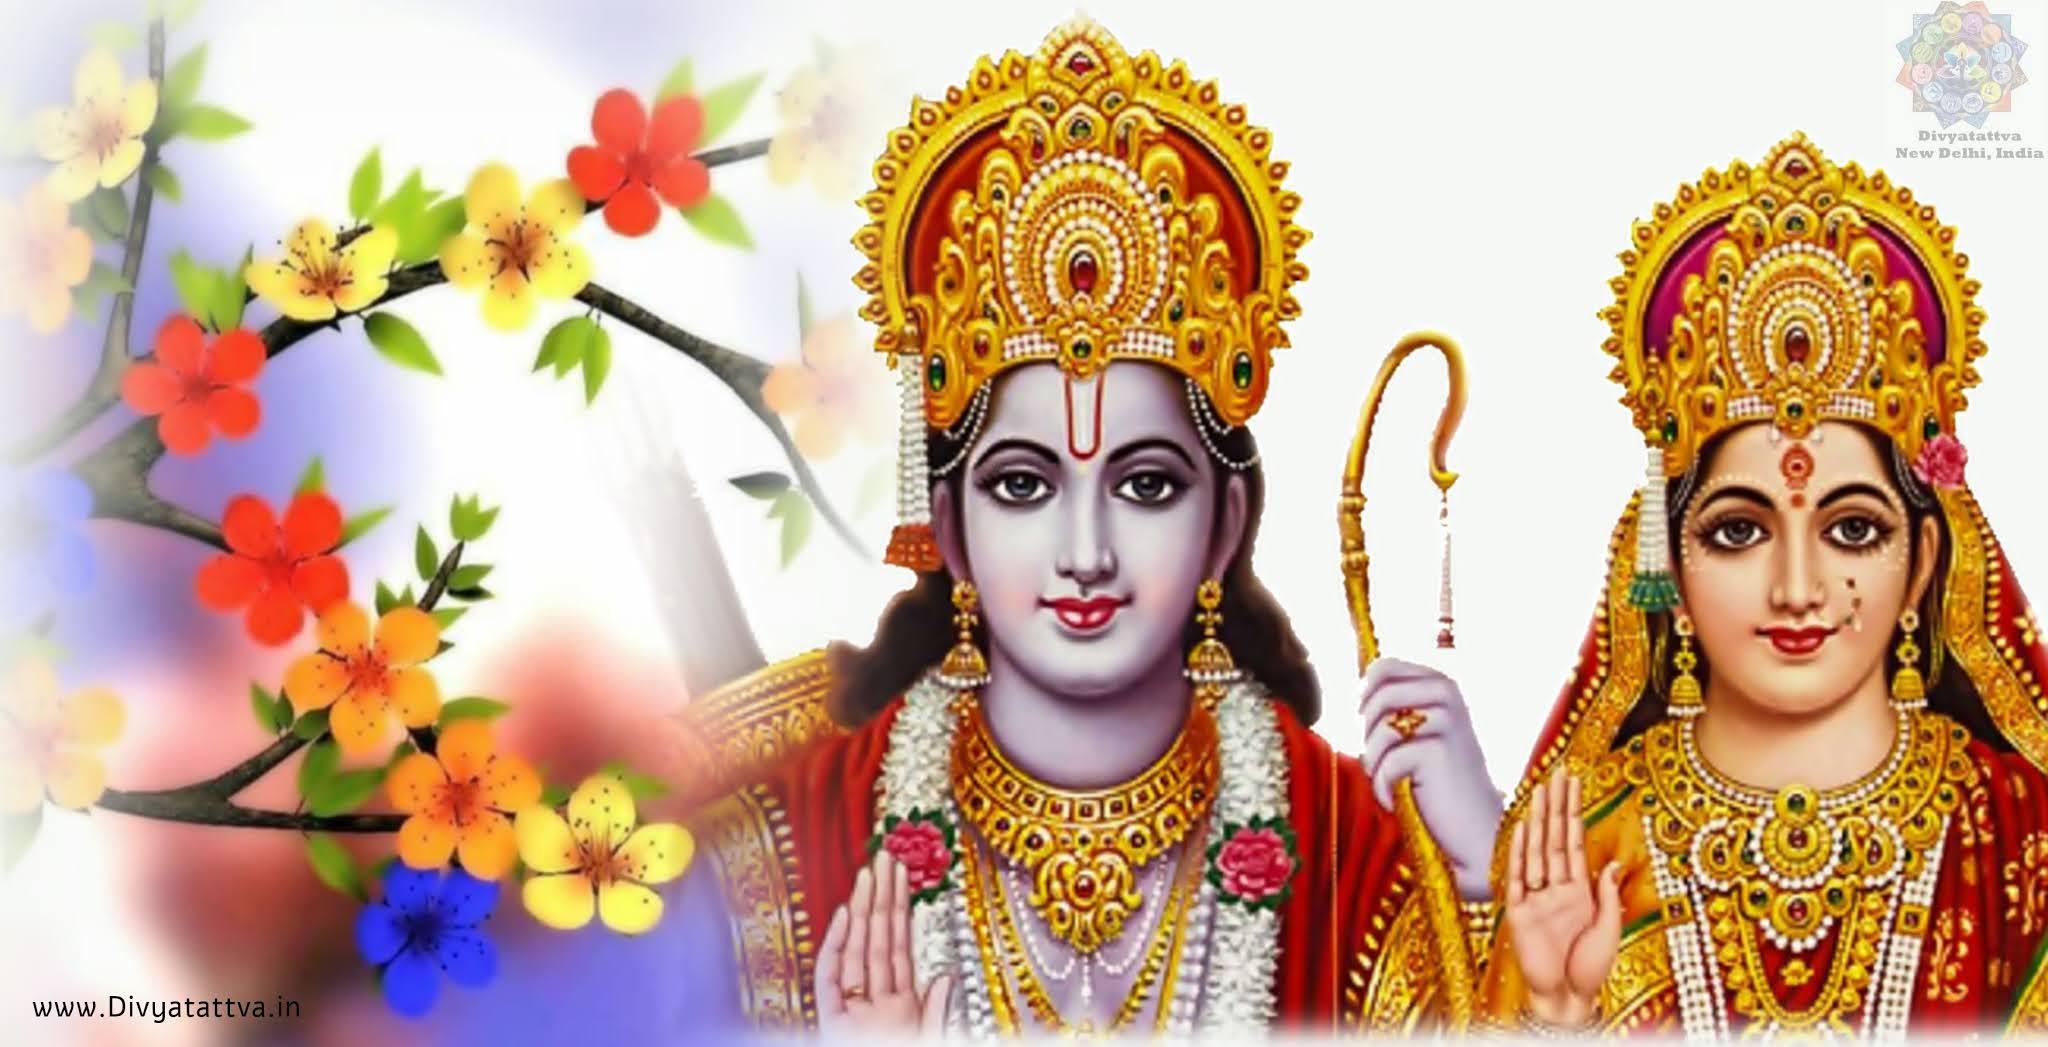 Hindu Gods Beautiful Photos of Lord Rama, Sita, Hanuman, Laxman or Rama Parivar Wallpapers